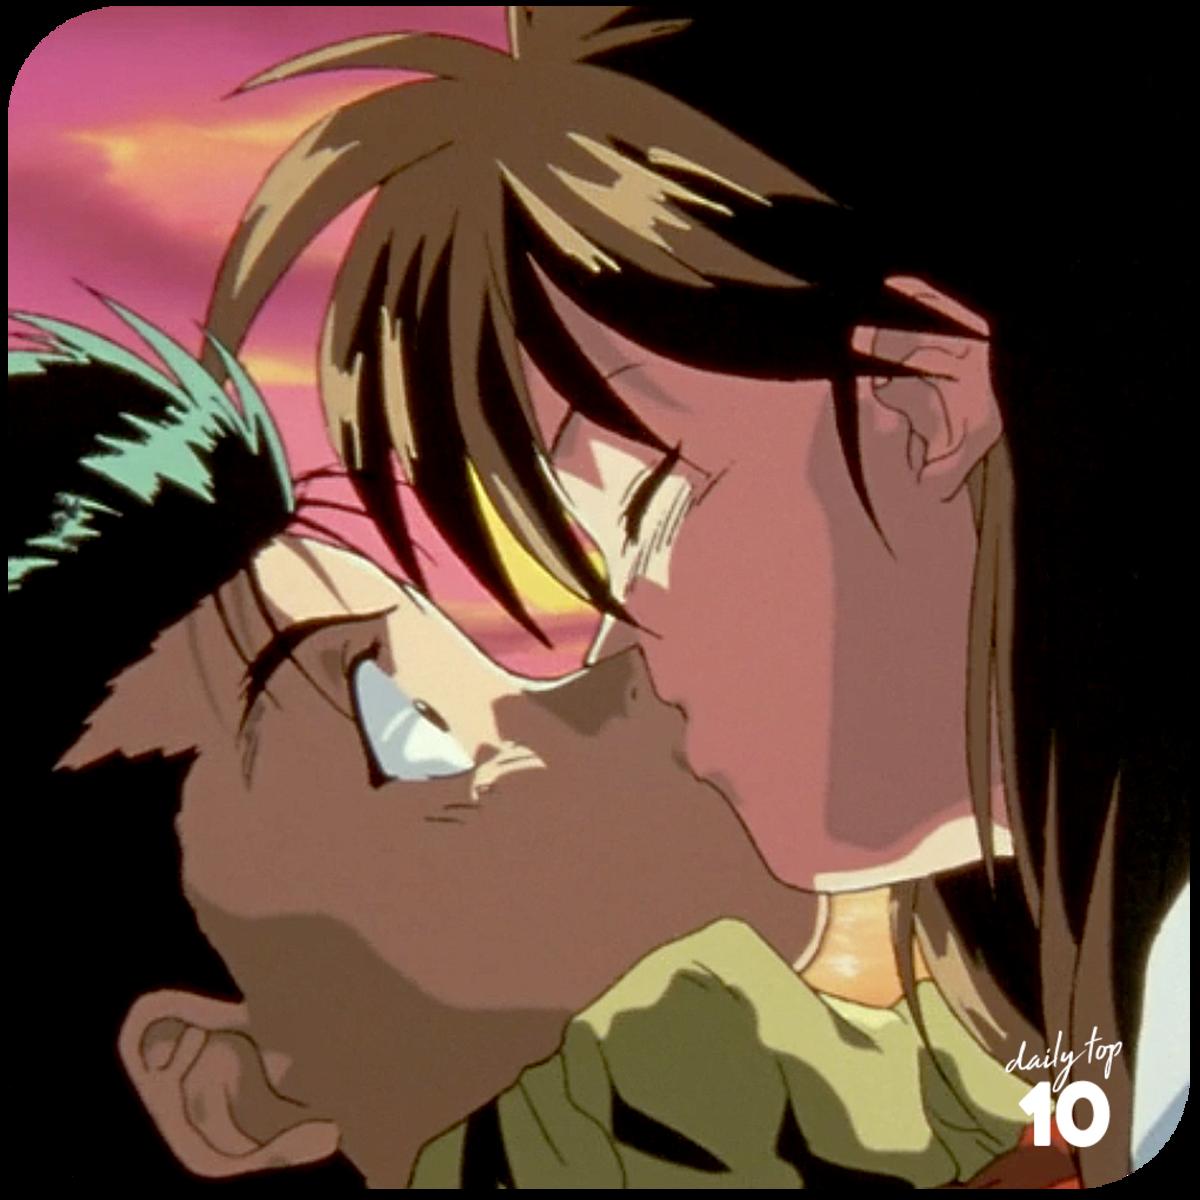 Yusuke and Keiko kissing